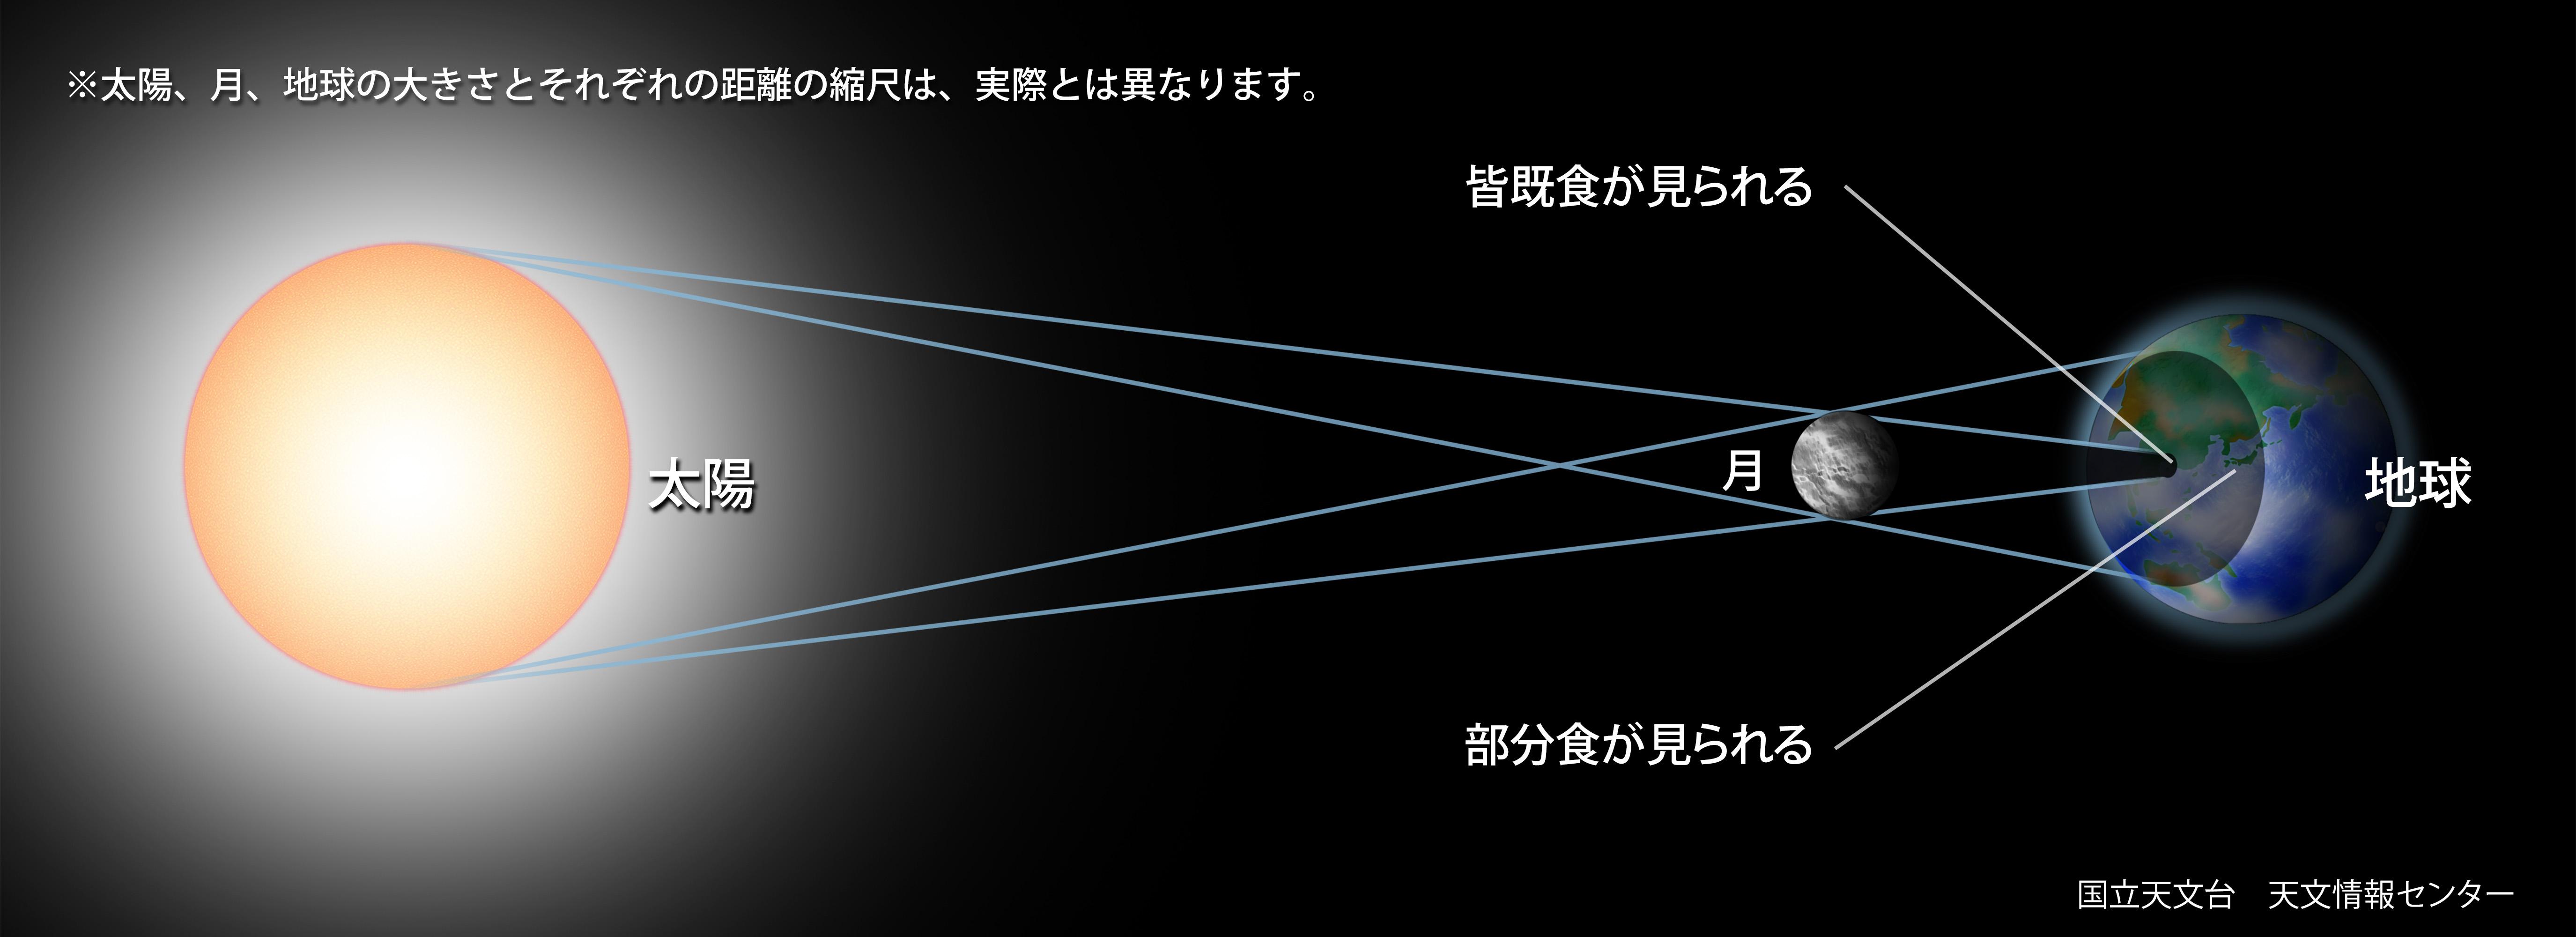 https://www.nao.ac.jp/contents/astro/sky/2017/08/topics04-2-l.jpg